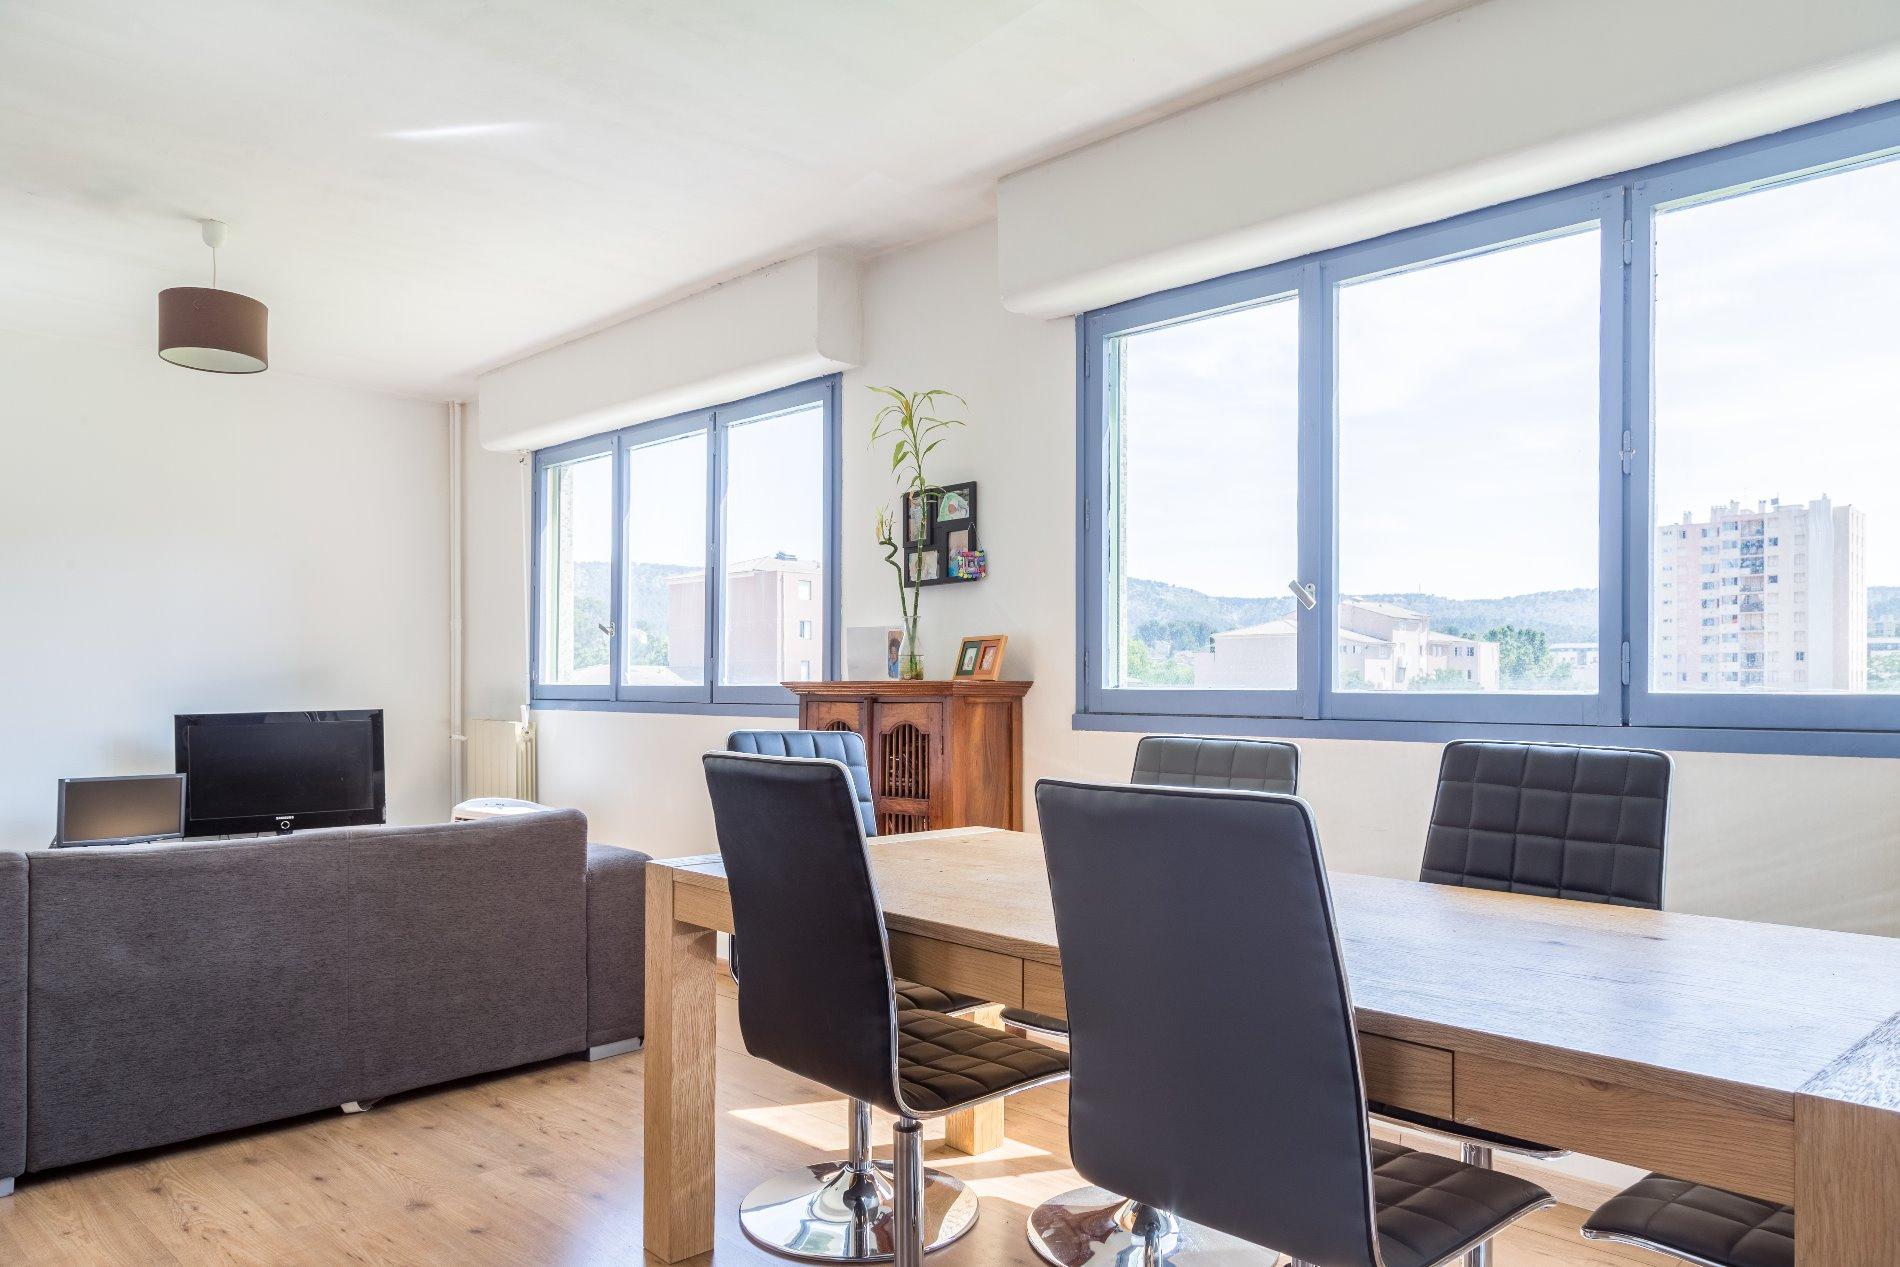 annonce vente appartement aubagne 13400 86 m 141 500. Black Bedroom Furniture Sets. Home Design Ideas